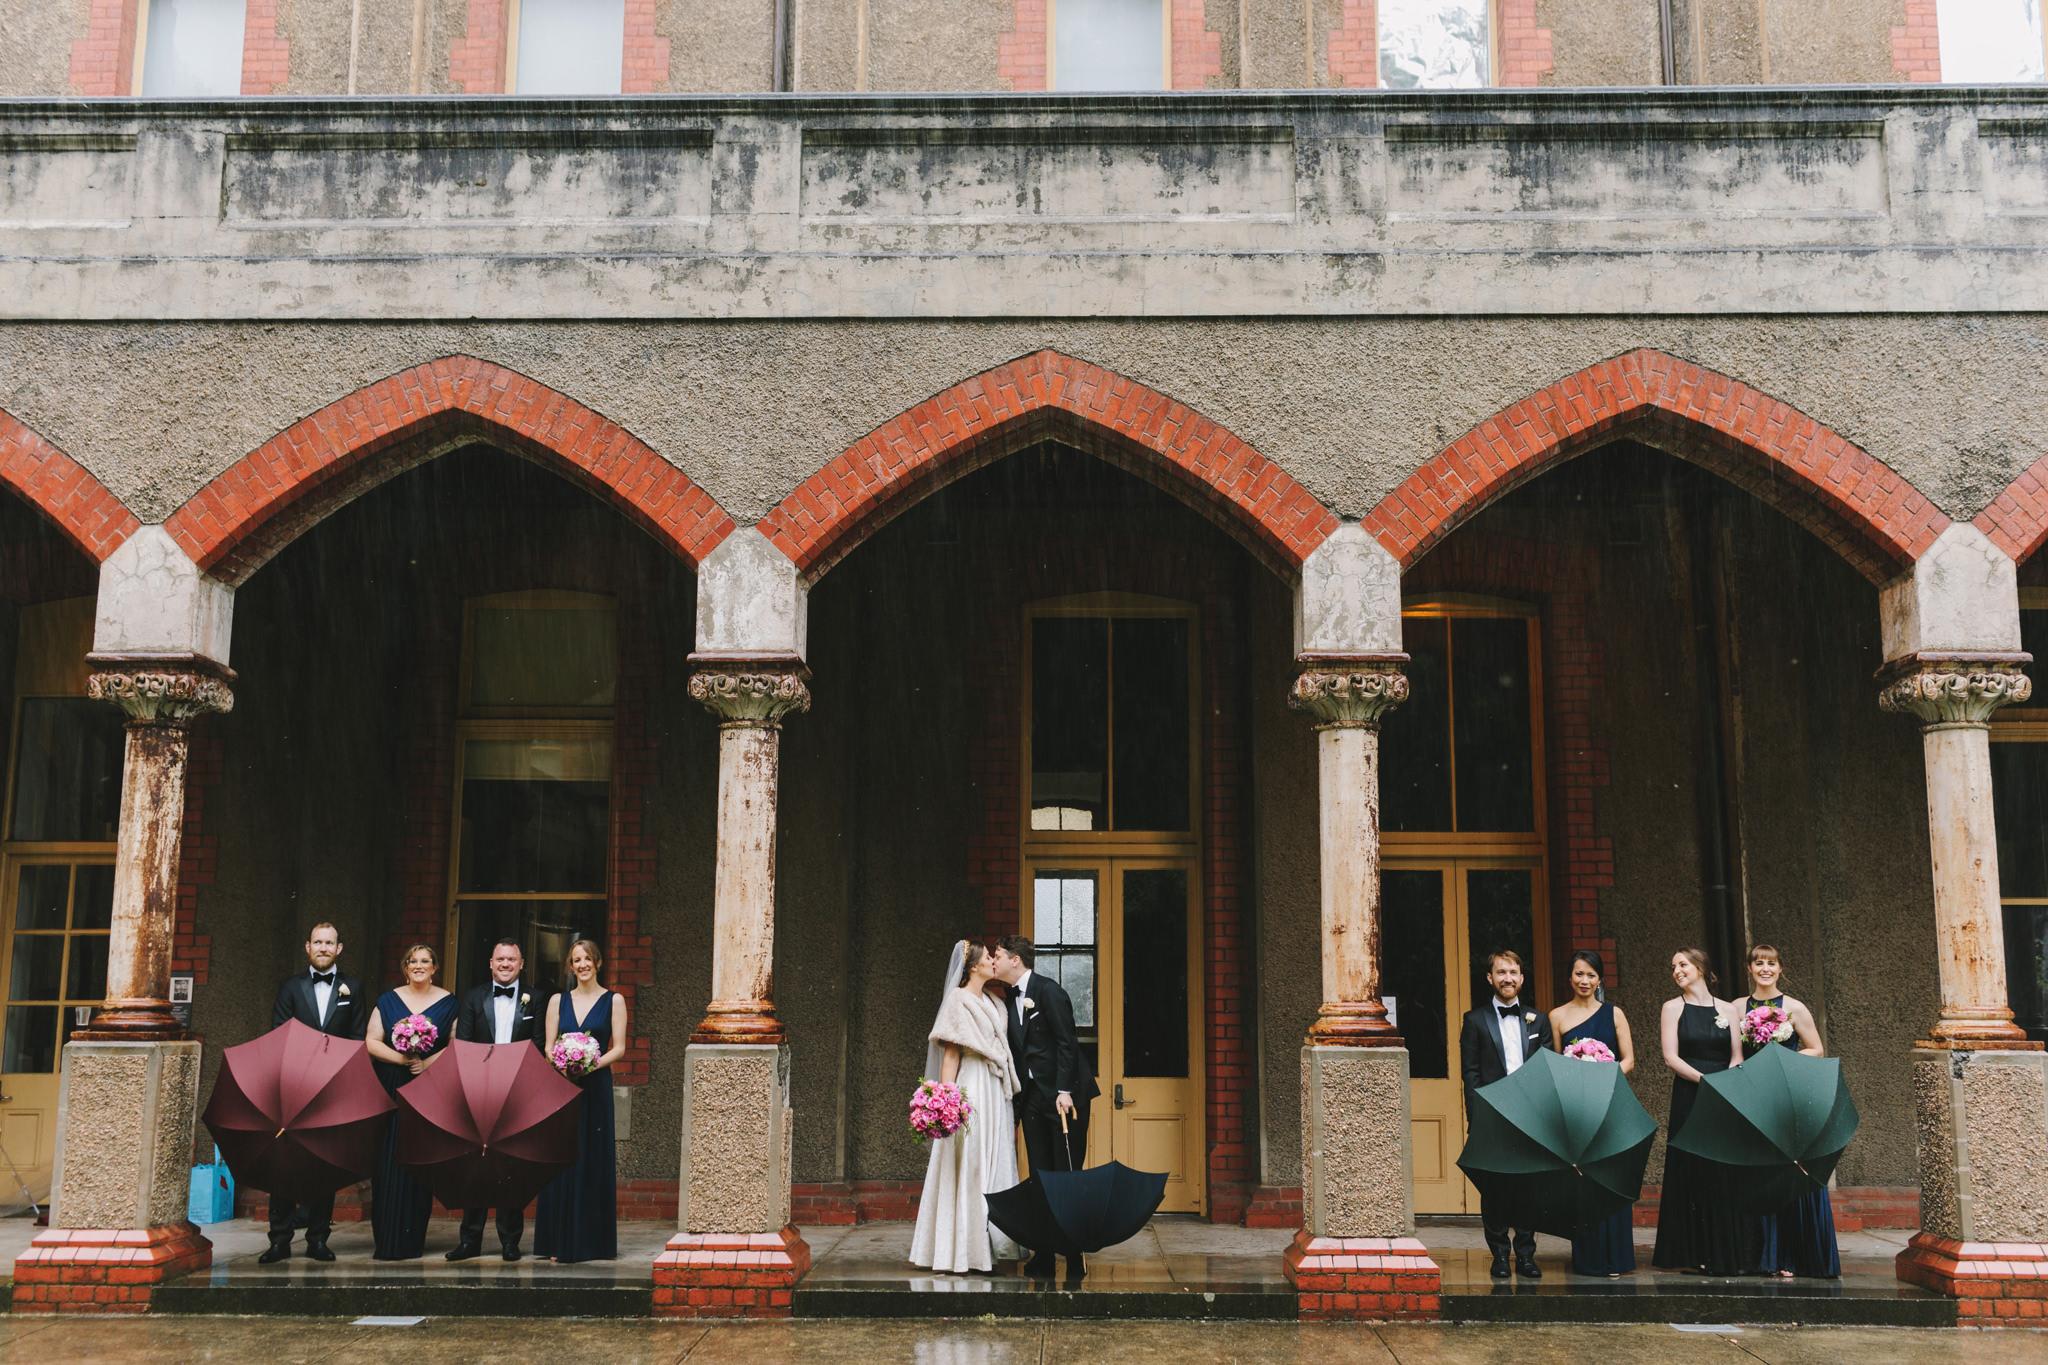 Abbotsford_Convent_Wedding_Peter_Anna080.JPG